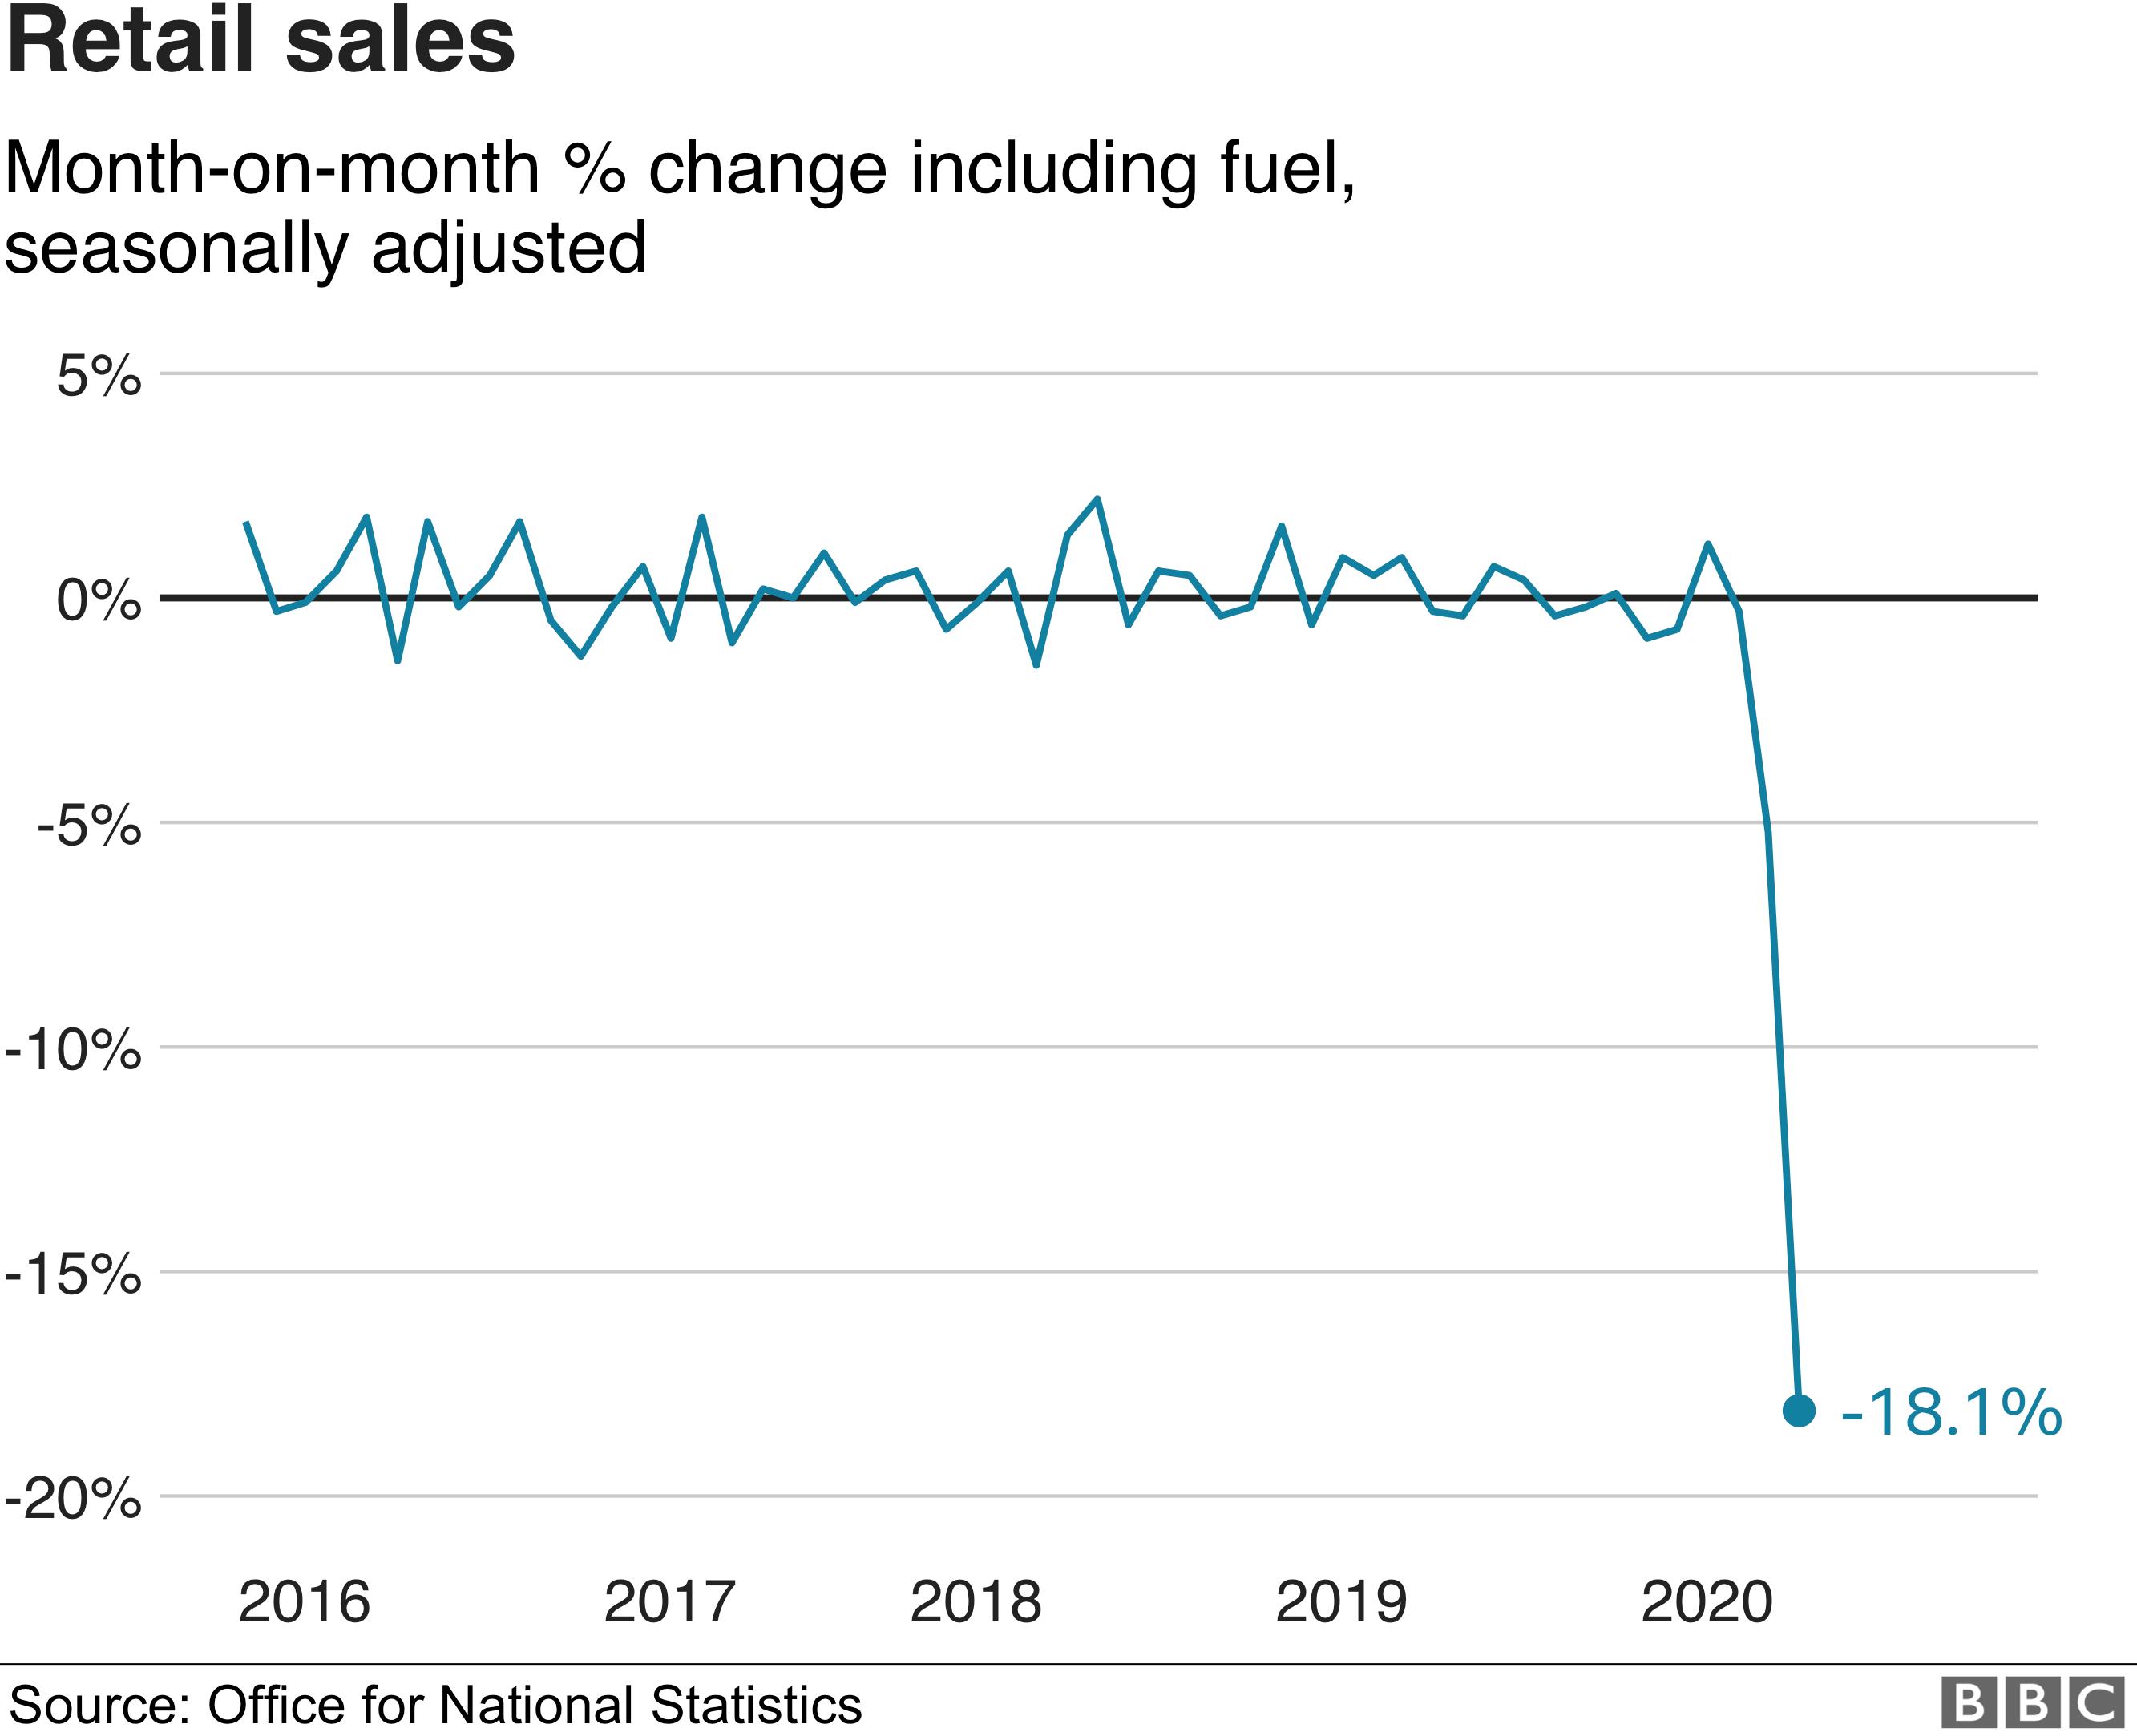 Retail sales chart for April 2020